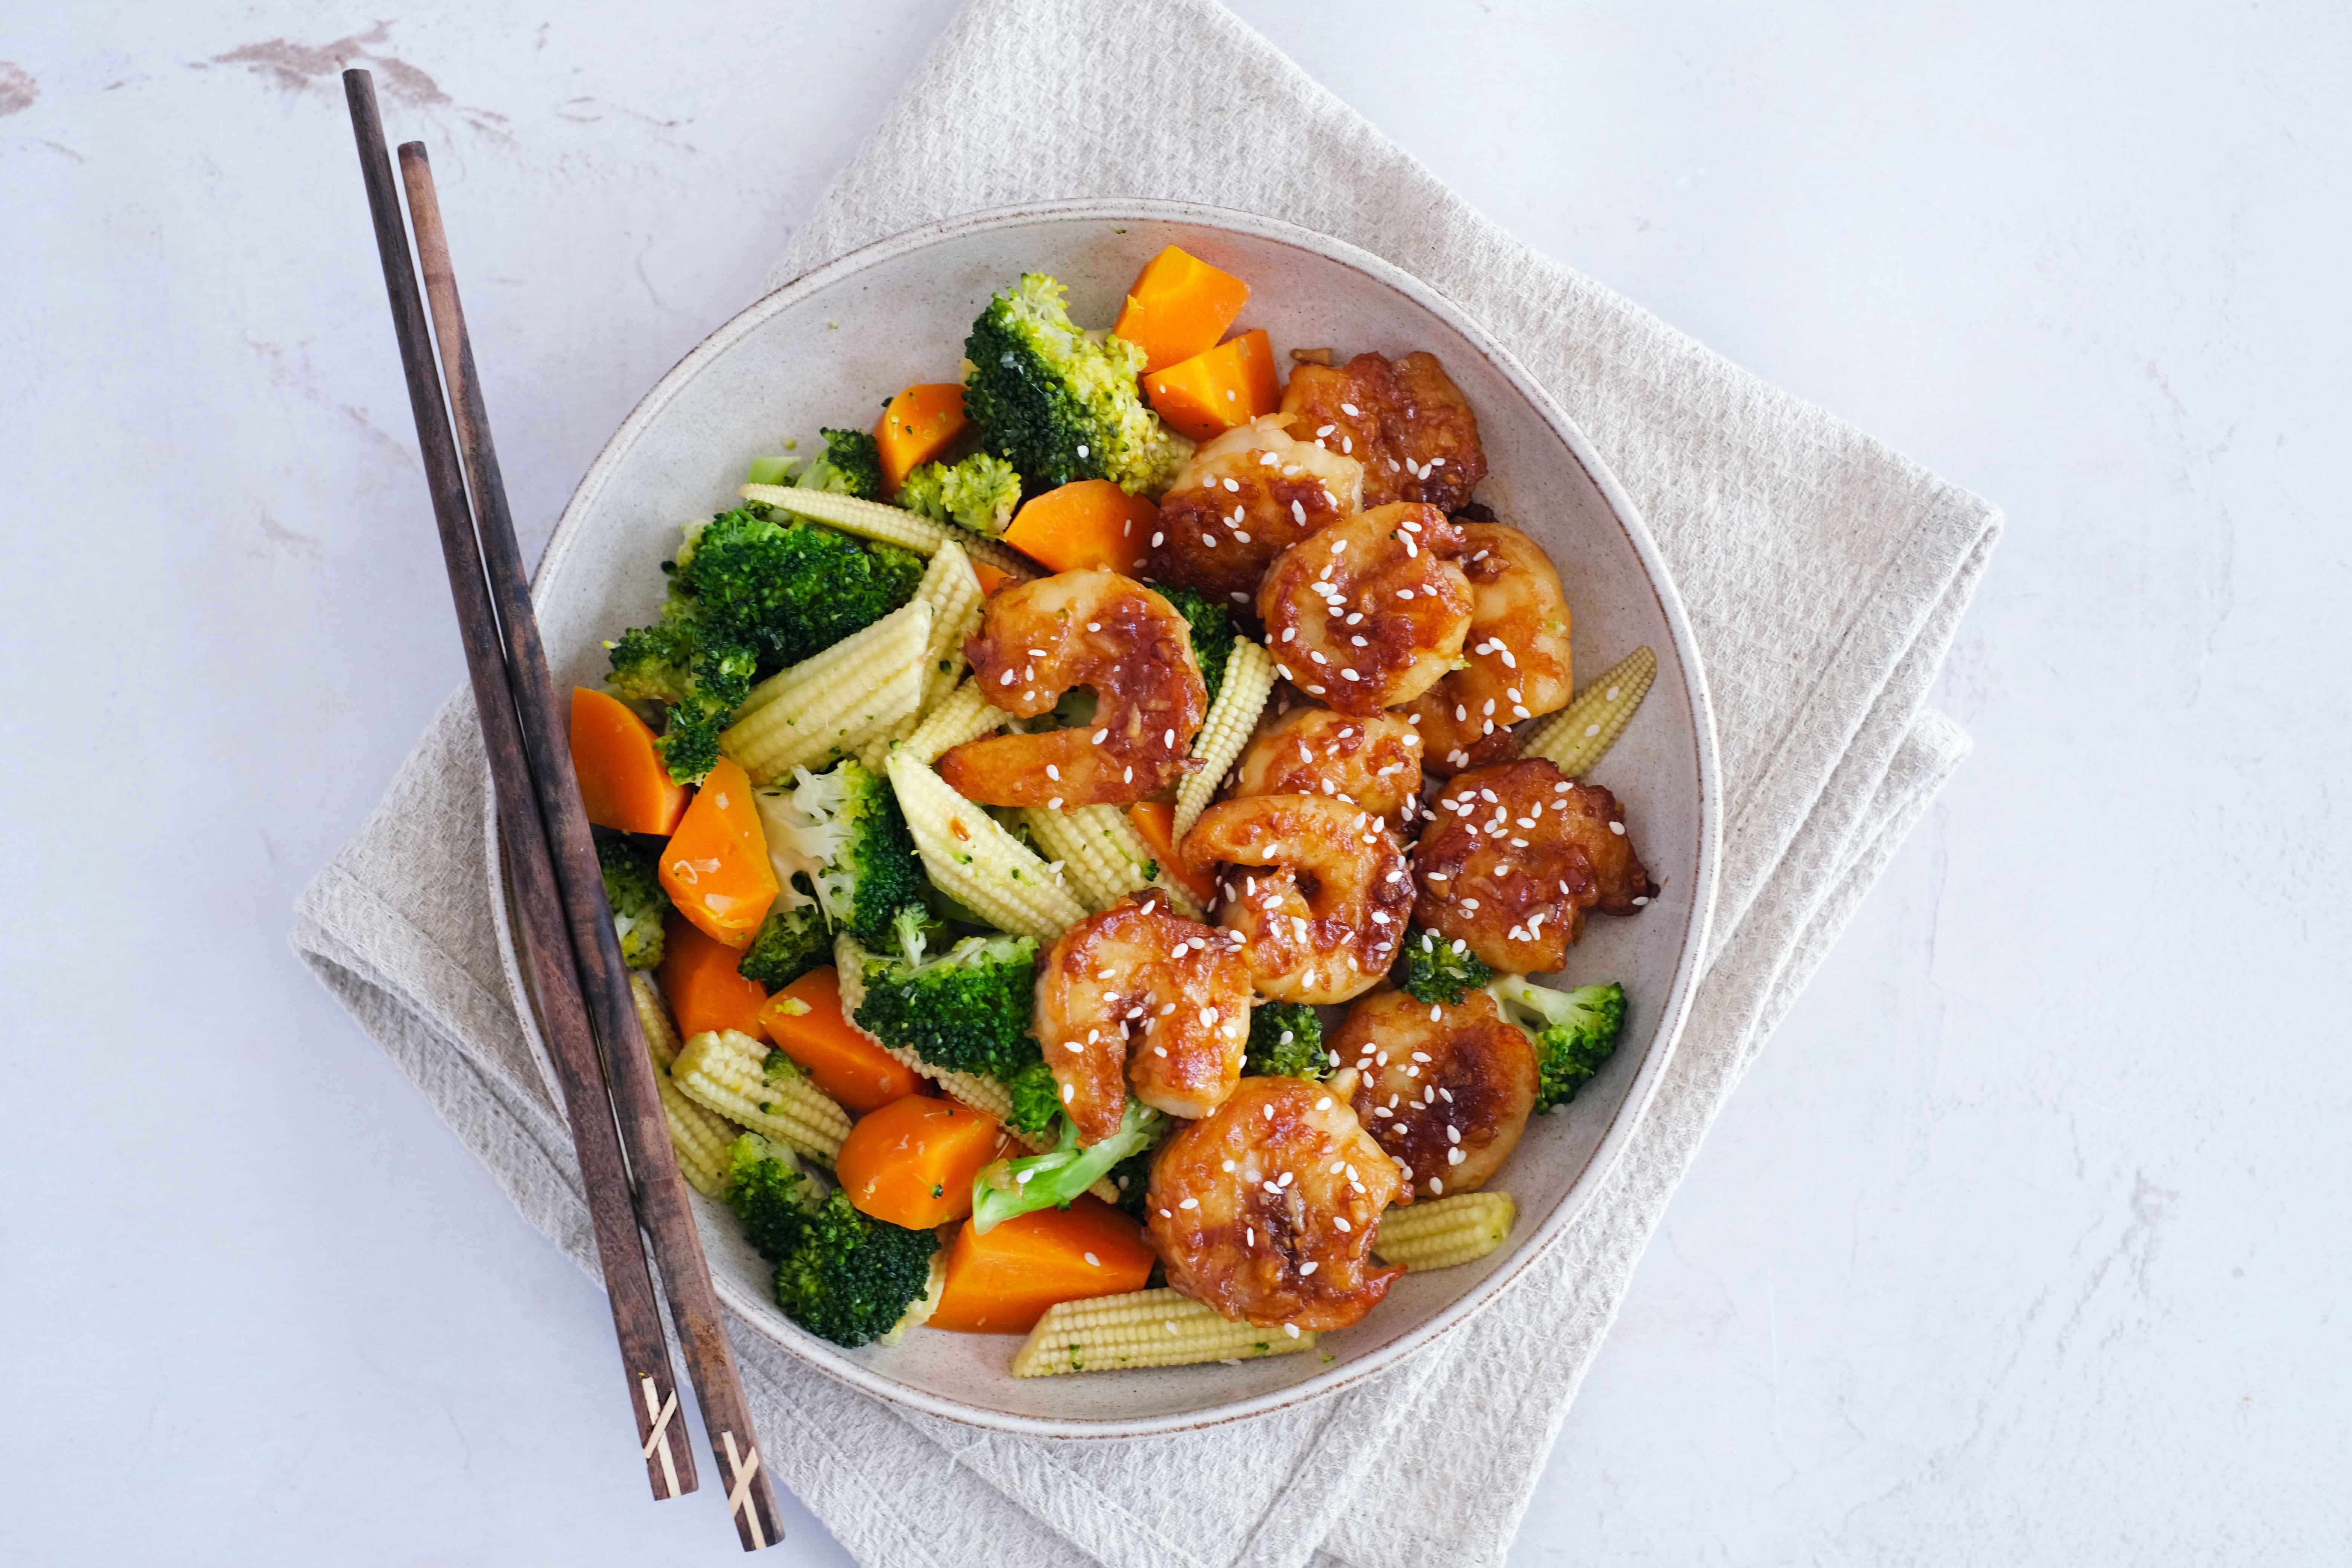 Garlicky Jumbo Prawns with Stir-fried Vegetables